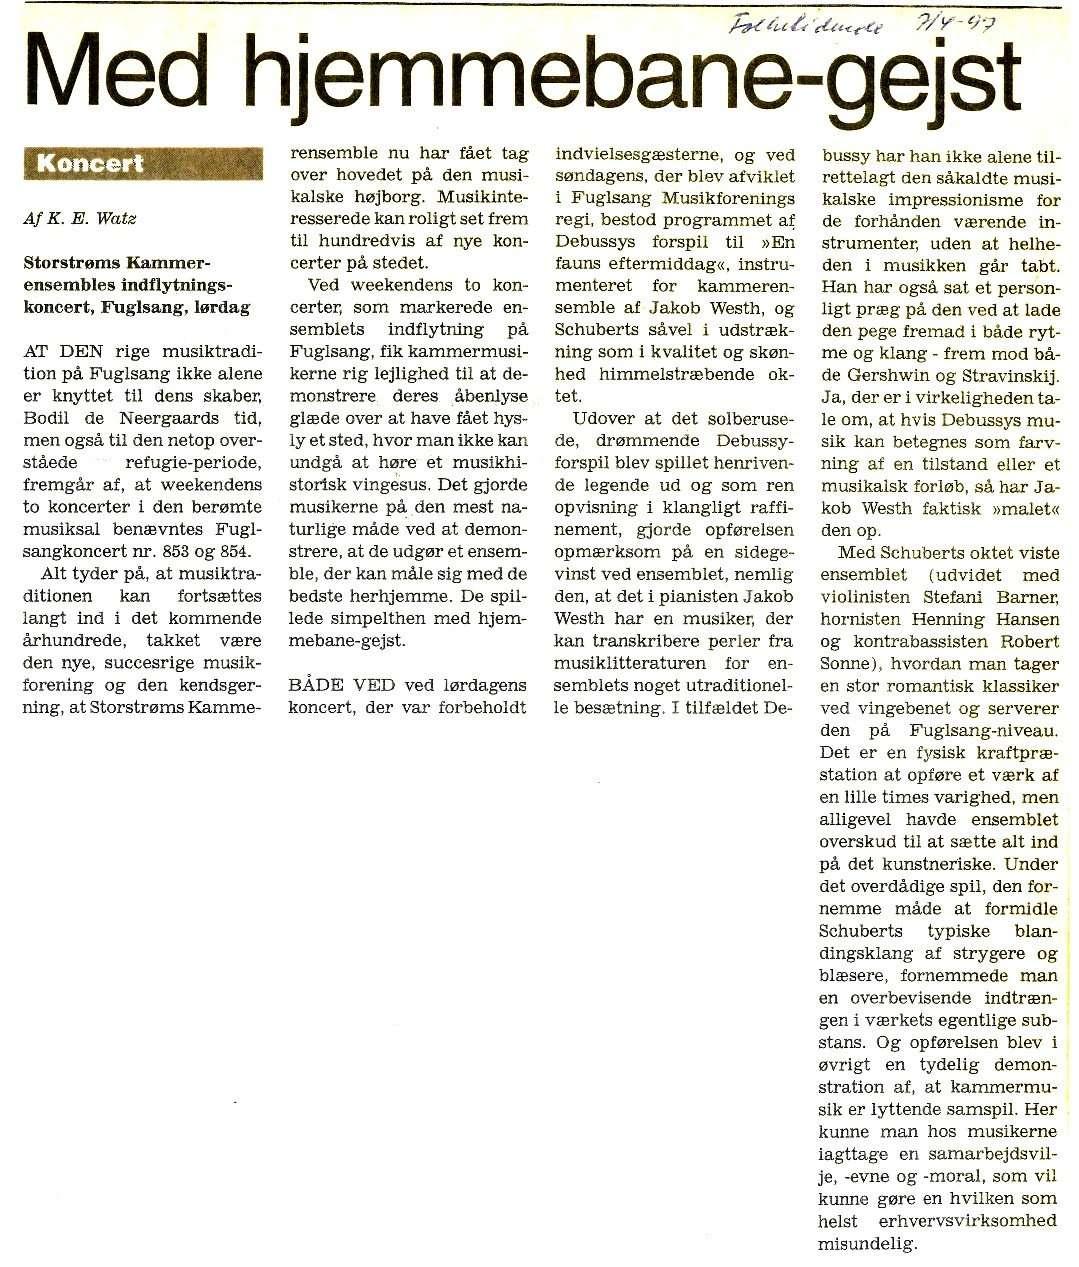 Artikel, Folketidende, april 1997